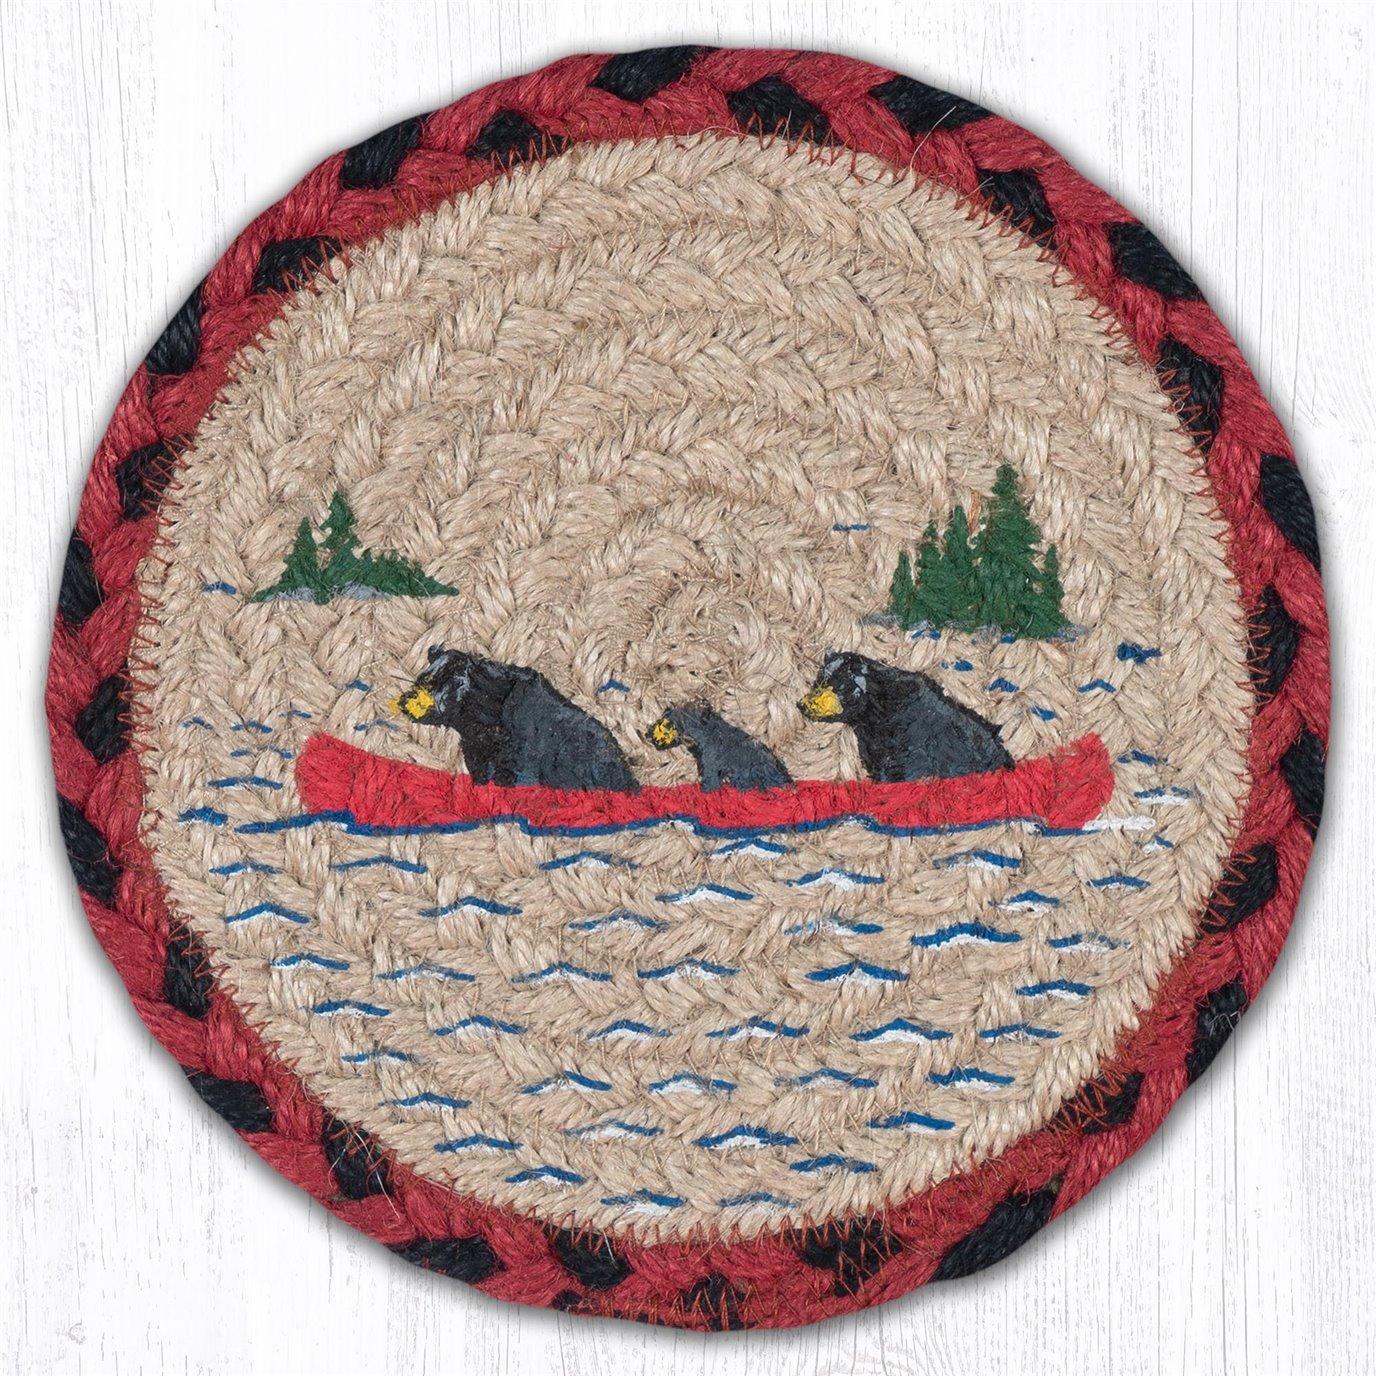 "Bears in Canoe Round Large Braided Coaster 7""x7"" Set of 4"